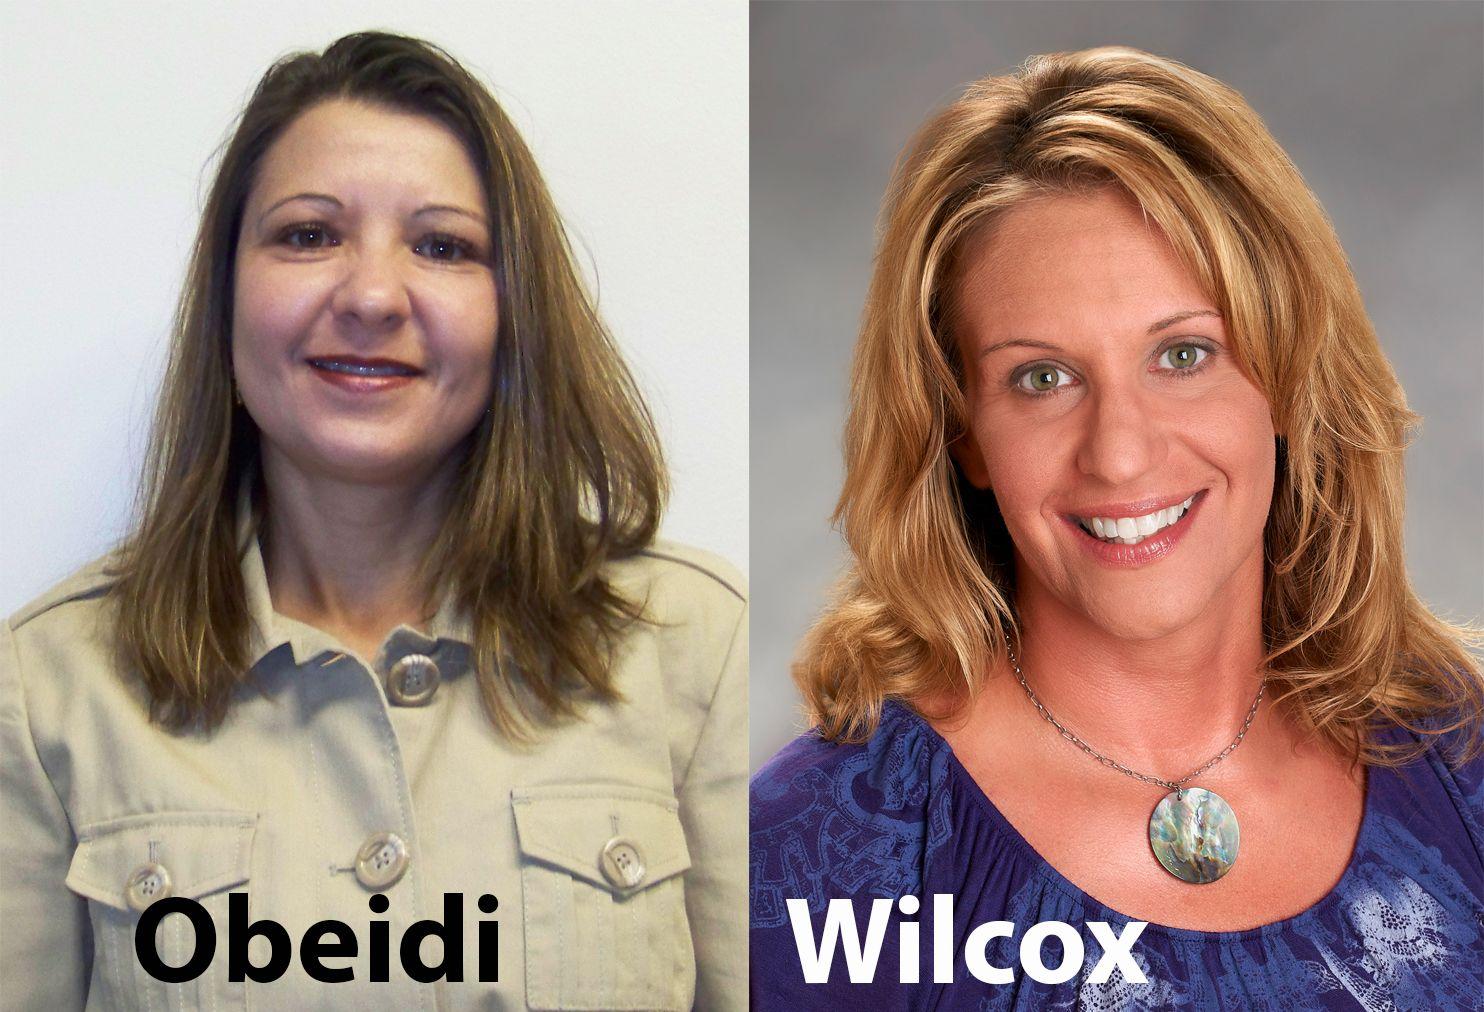 Dr fida obeidi chemistry faculty member and heather